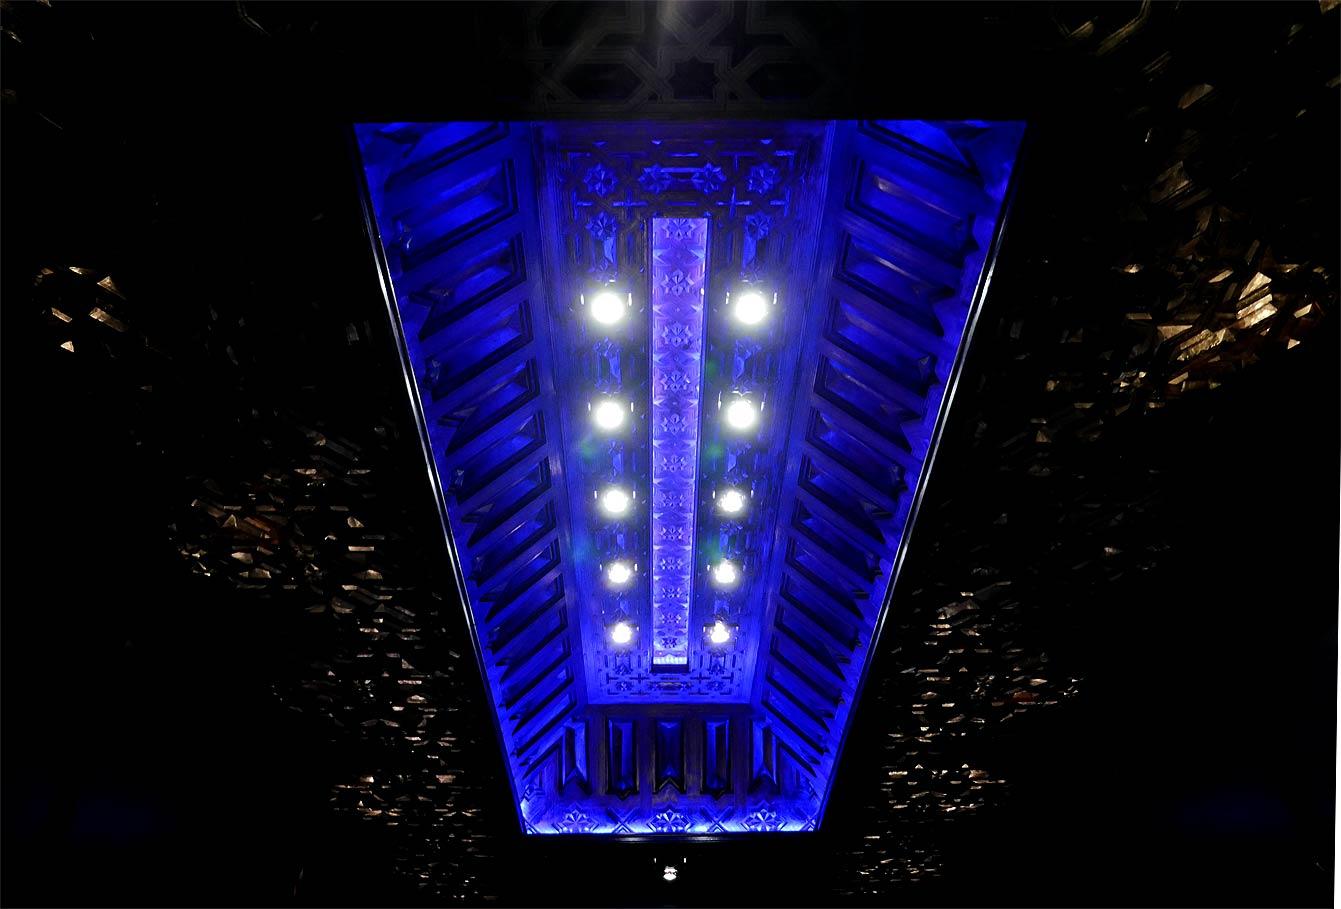 serge-lutens-espace-palais-royal-07